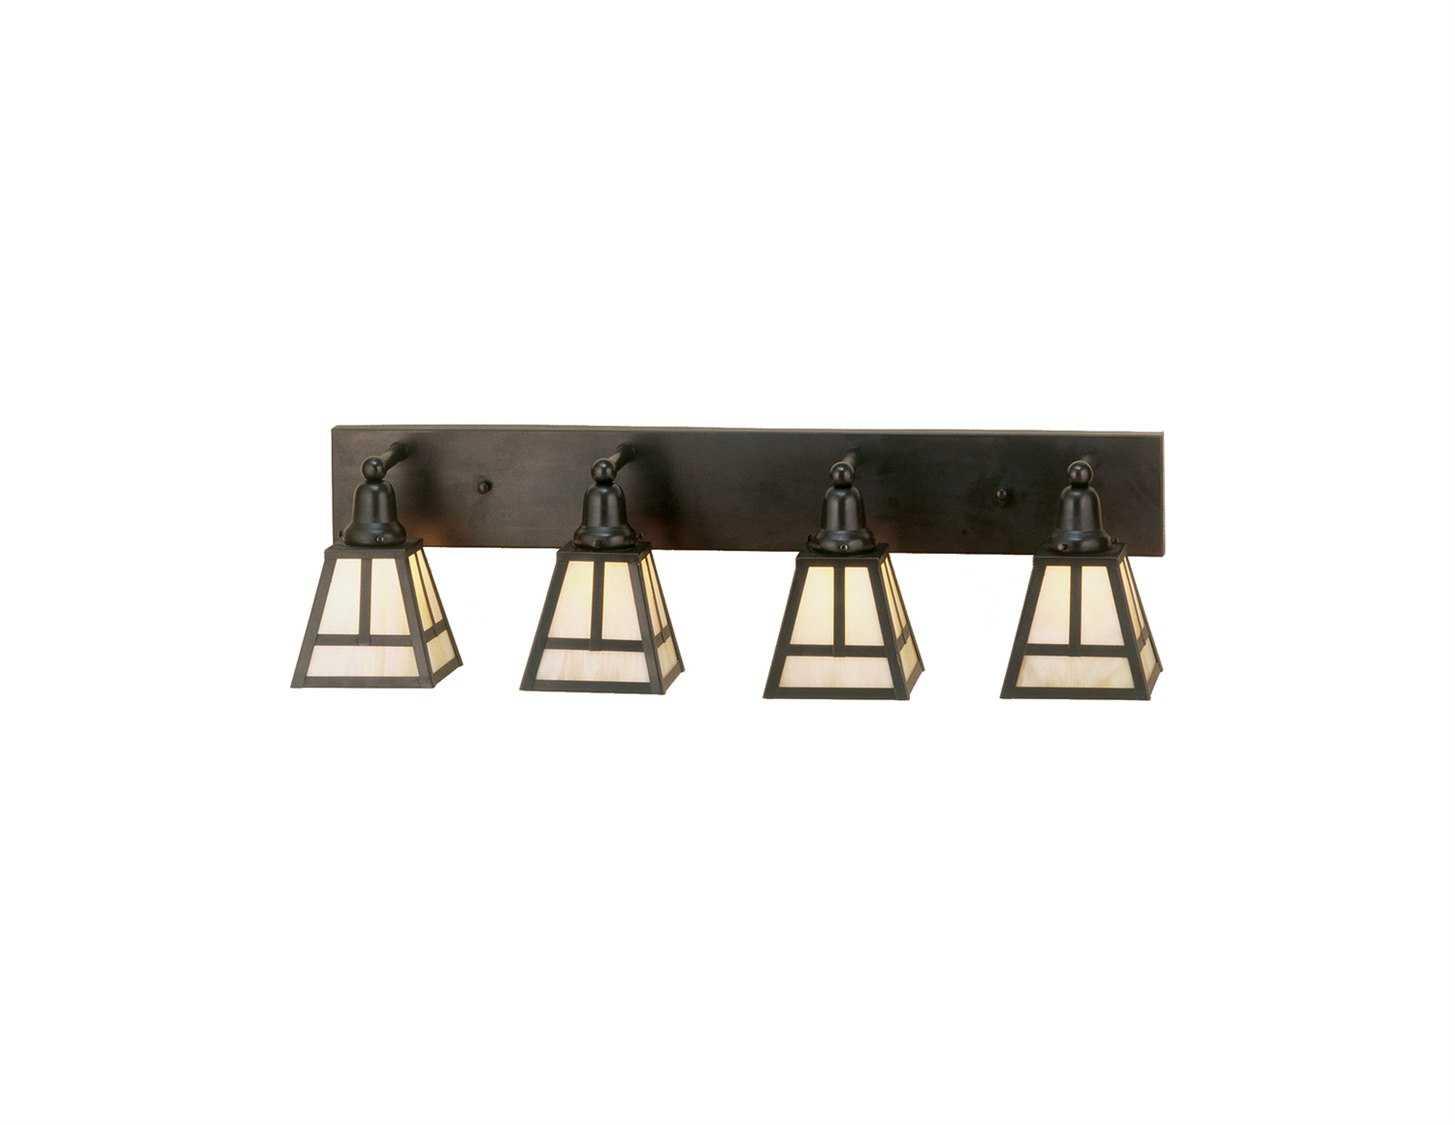 Meyda Tiffany T Mission Four-Light Vanity Bar Light 52451